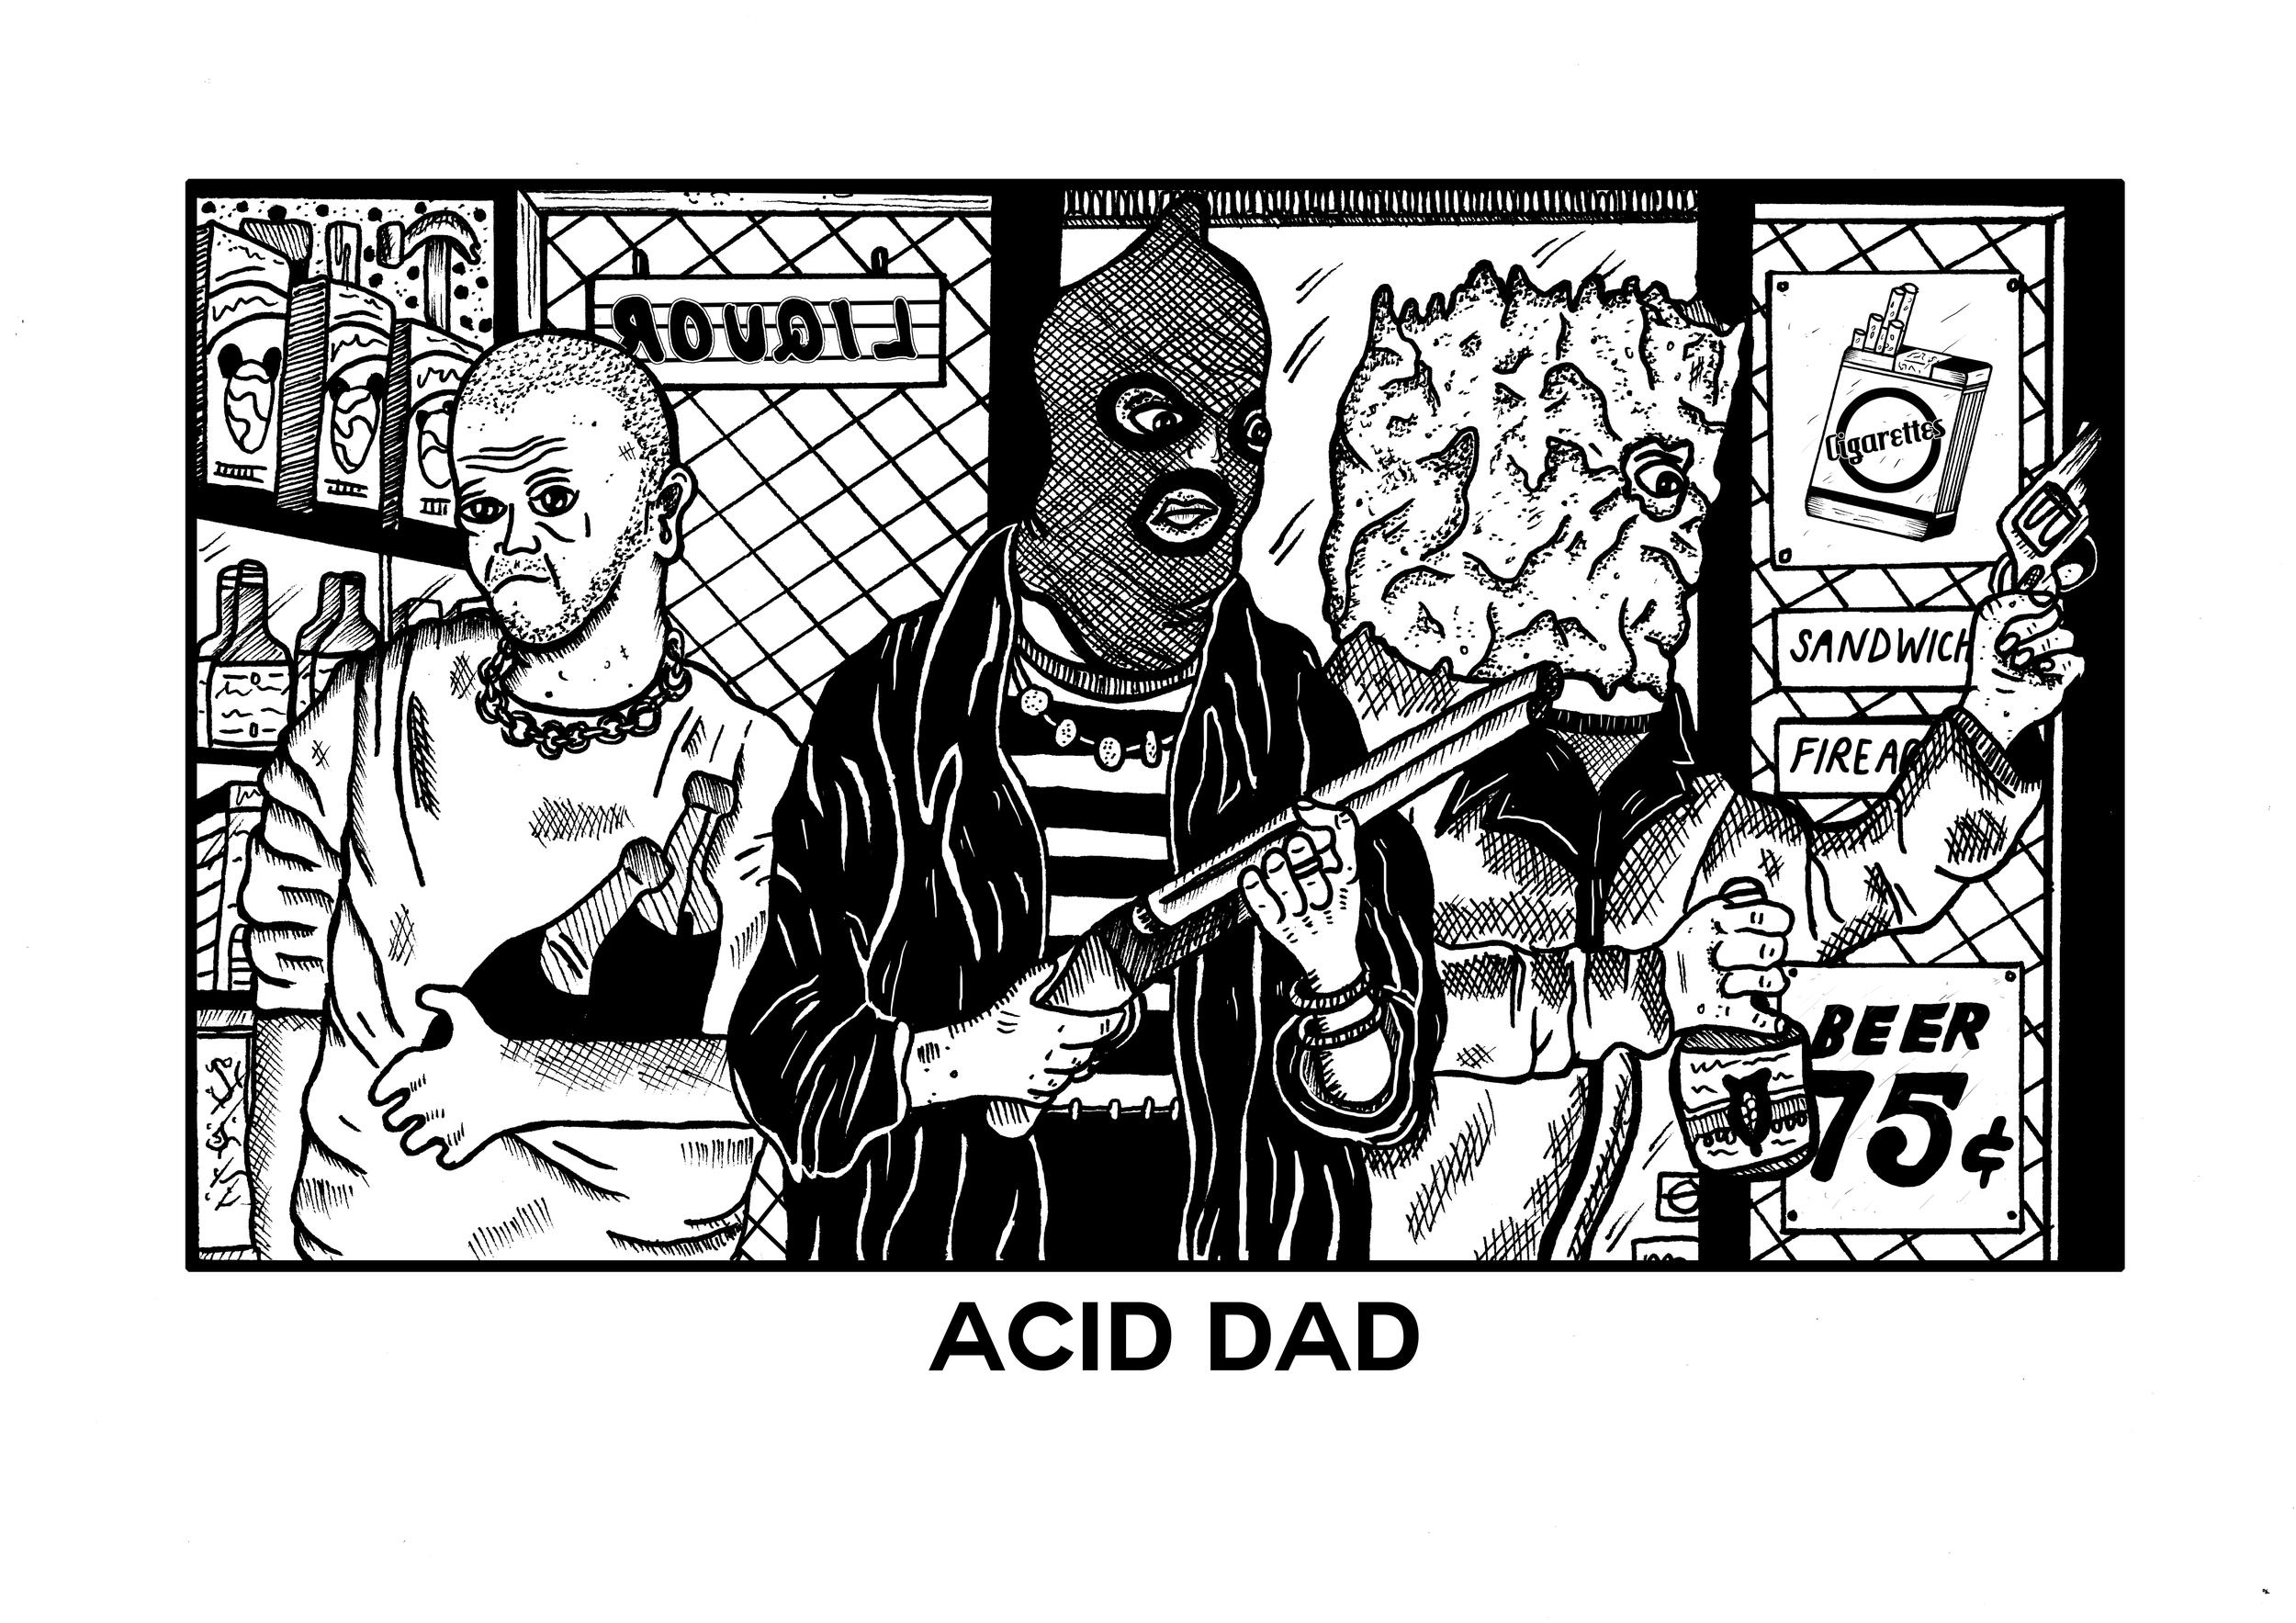 aciddadfont.jpg